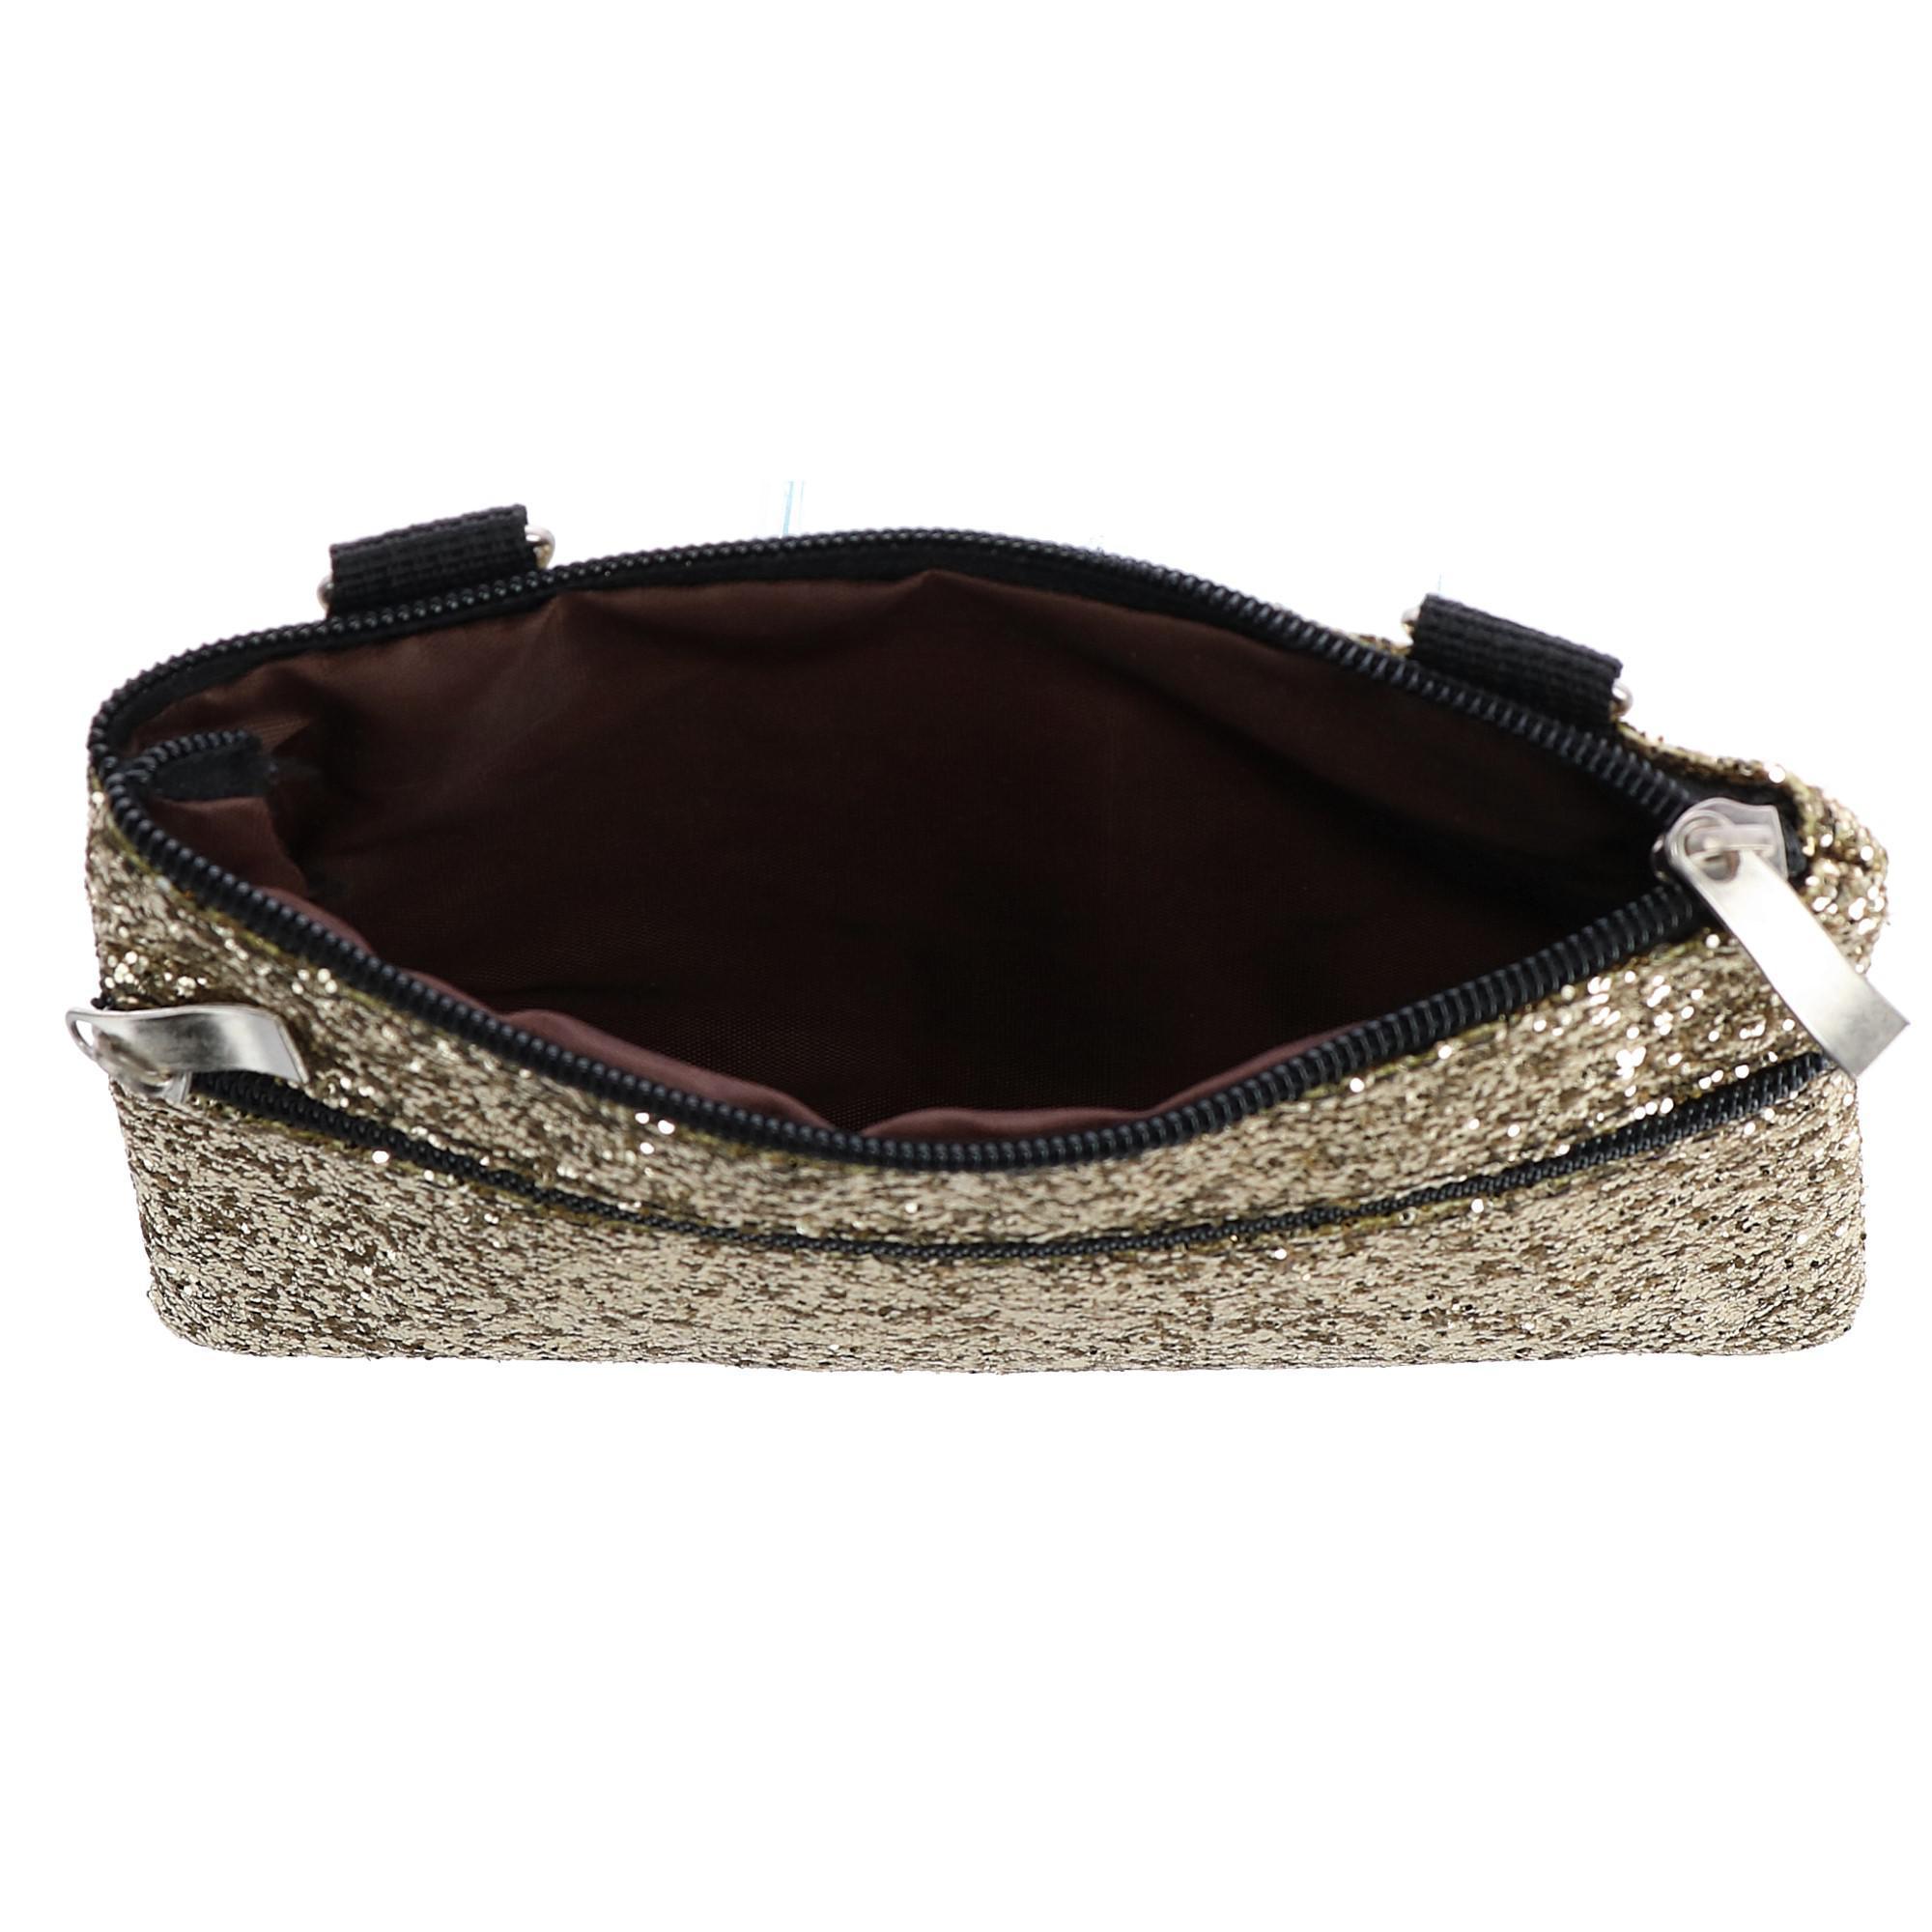 New-2-Moda-Fashion-Glitter-Waist-Pack-Convertible-Cross-Body-Bag thumbnail 9